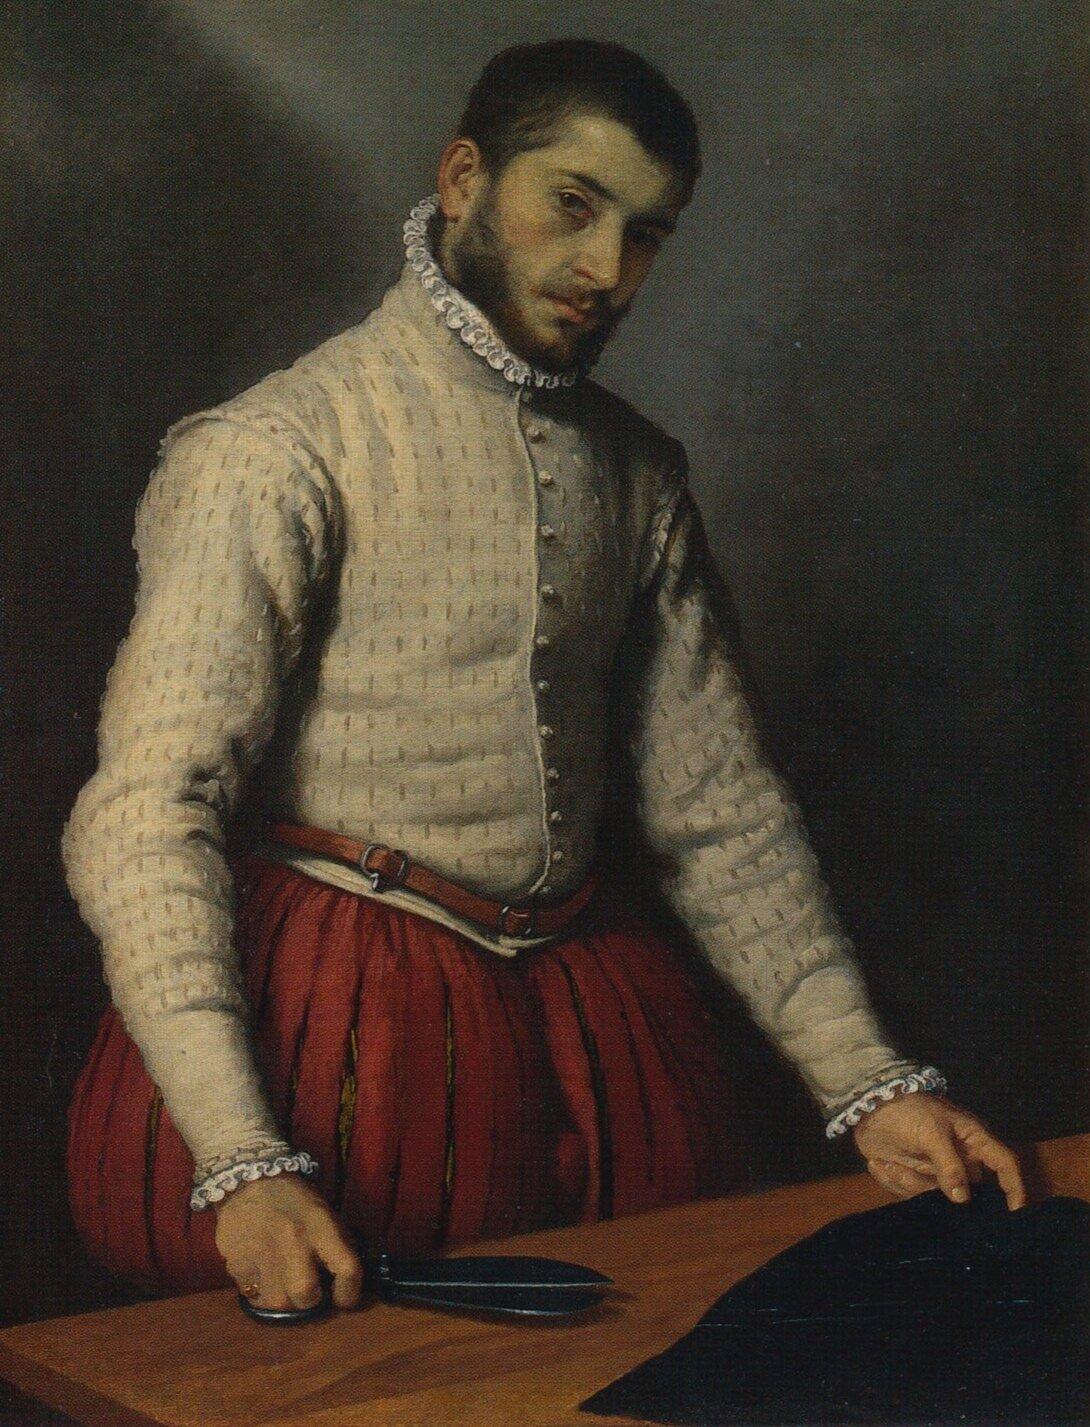 Moroni, 'The Tailor'